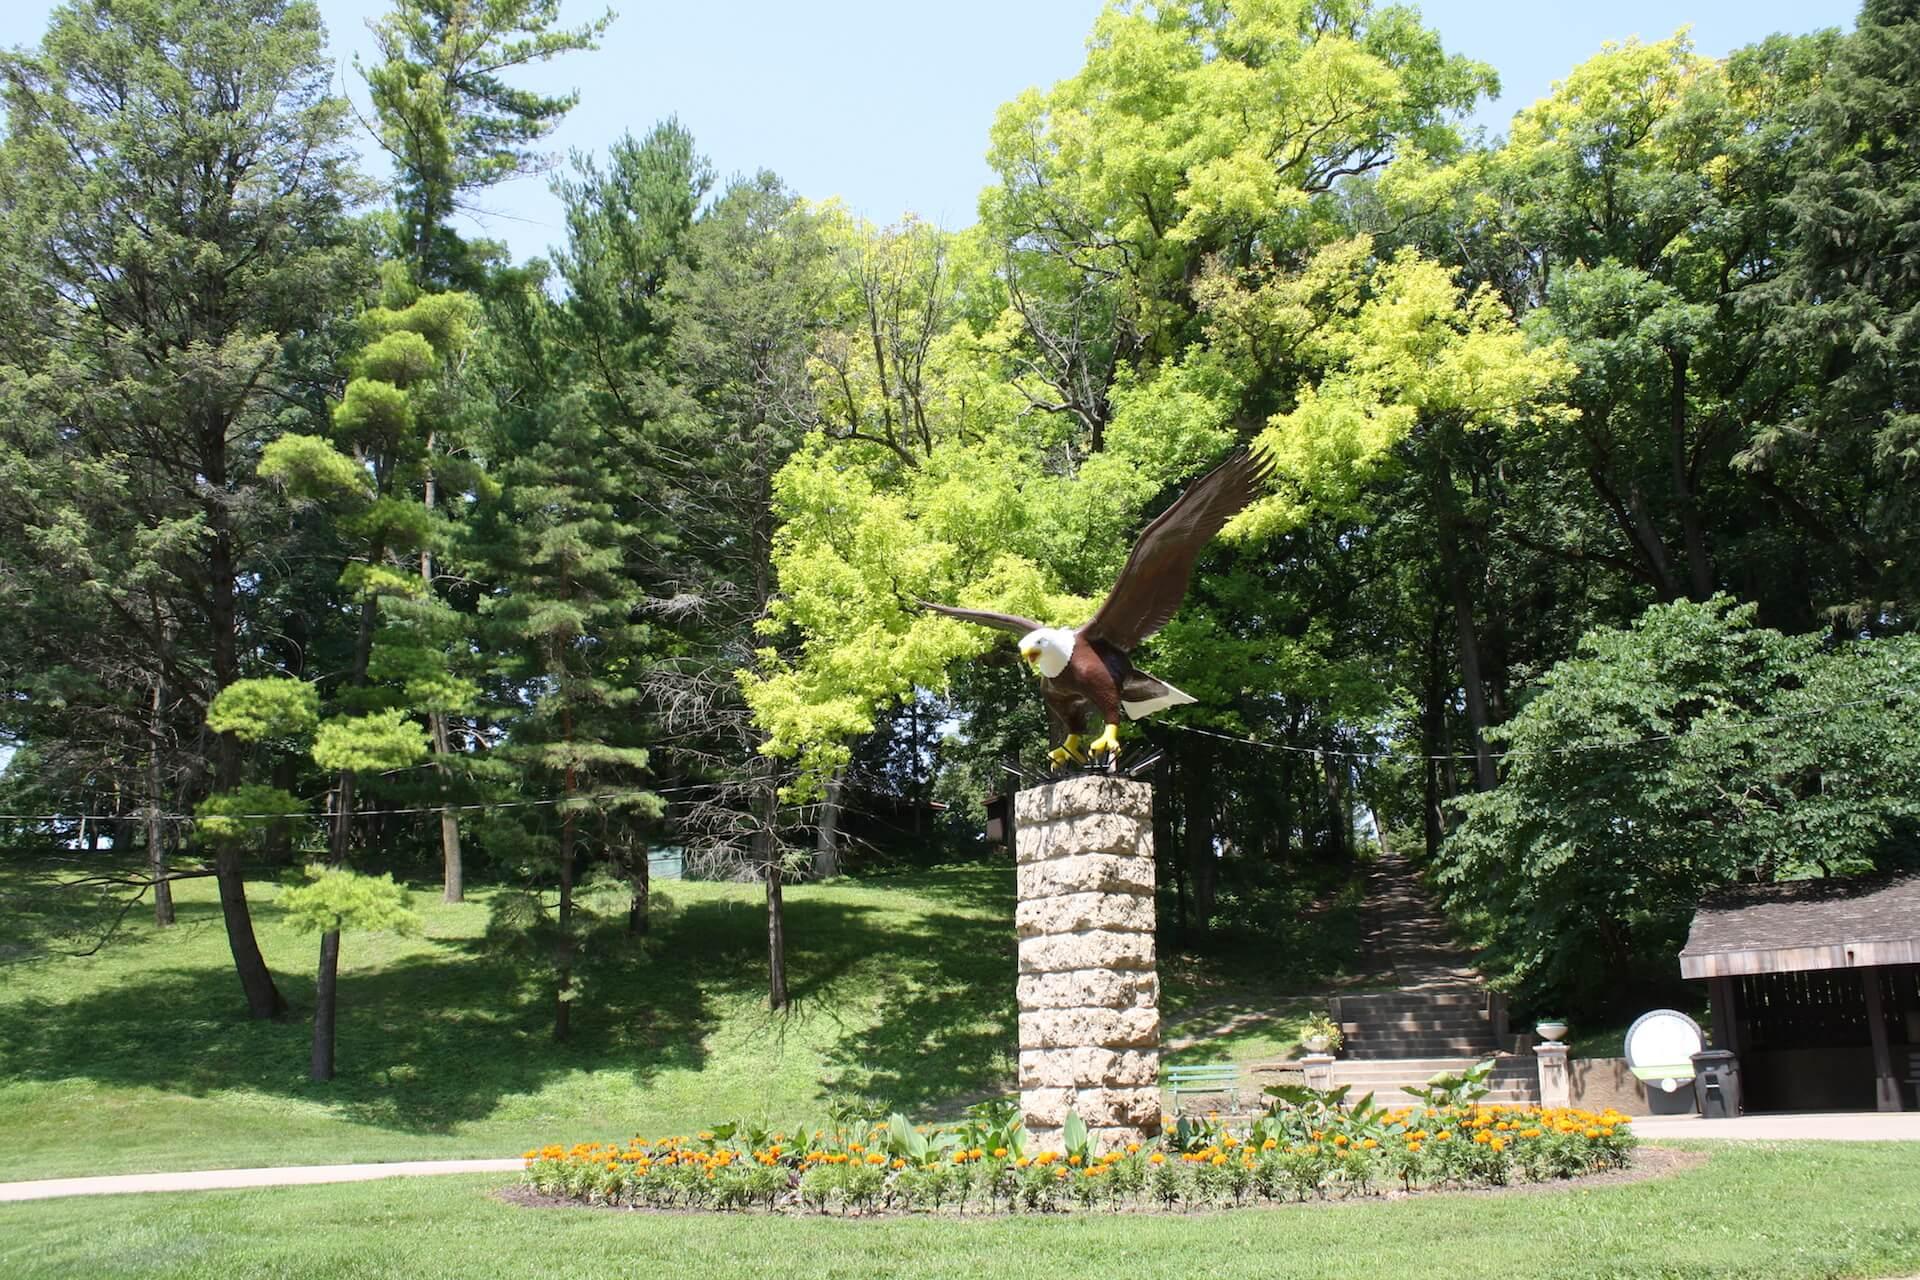 Eagle Point Park in Dubuque Iowa